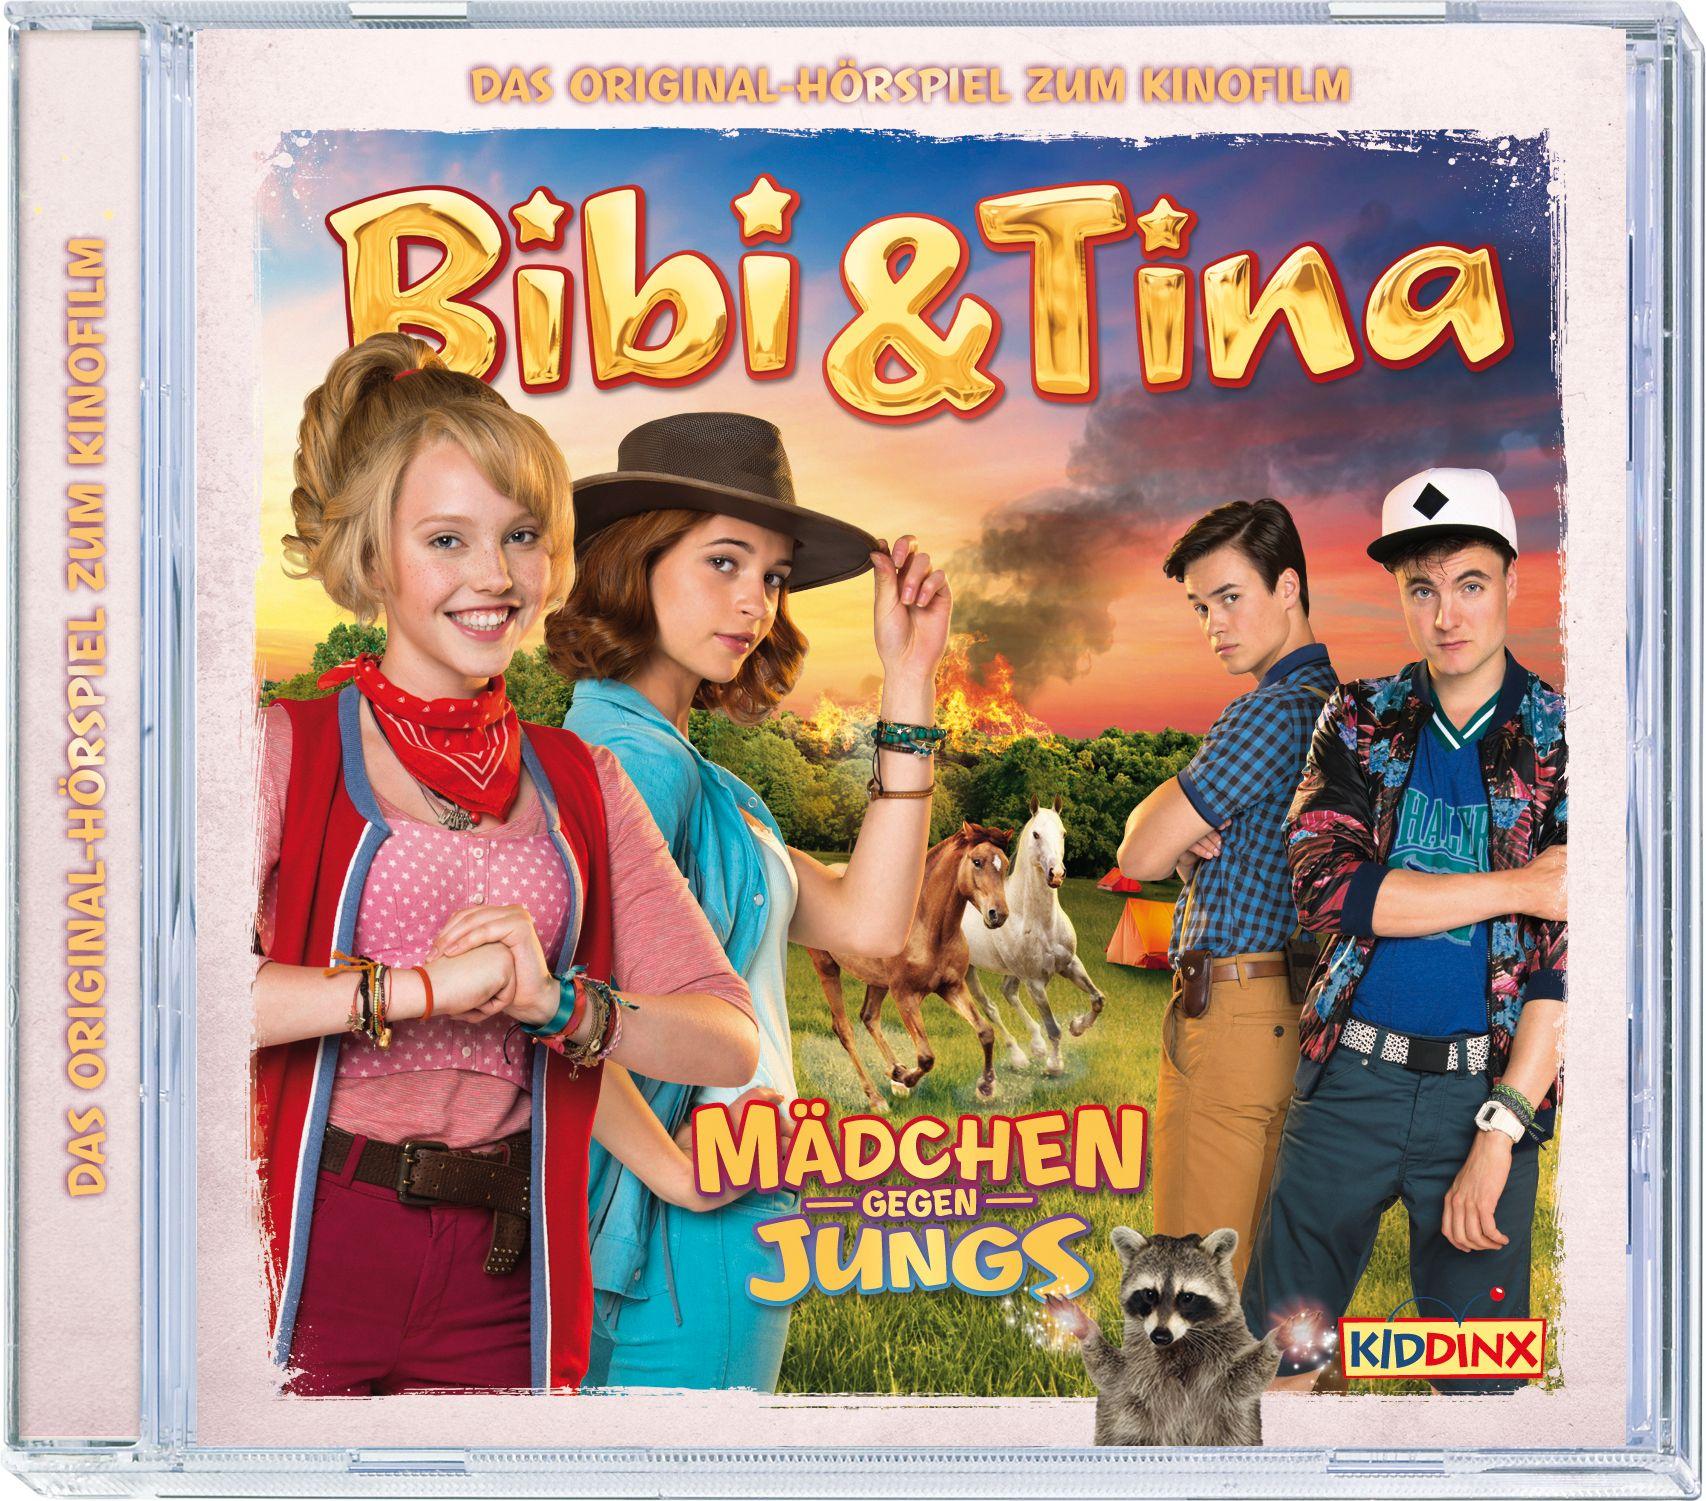 Bibi & Tina: Mädchen gegen Jungs - Kinofilm 3 H...